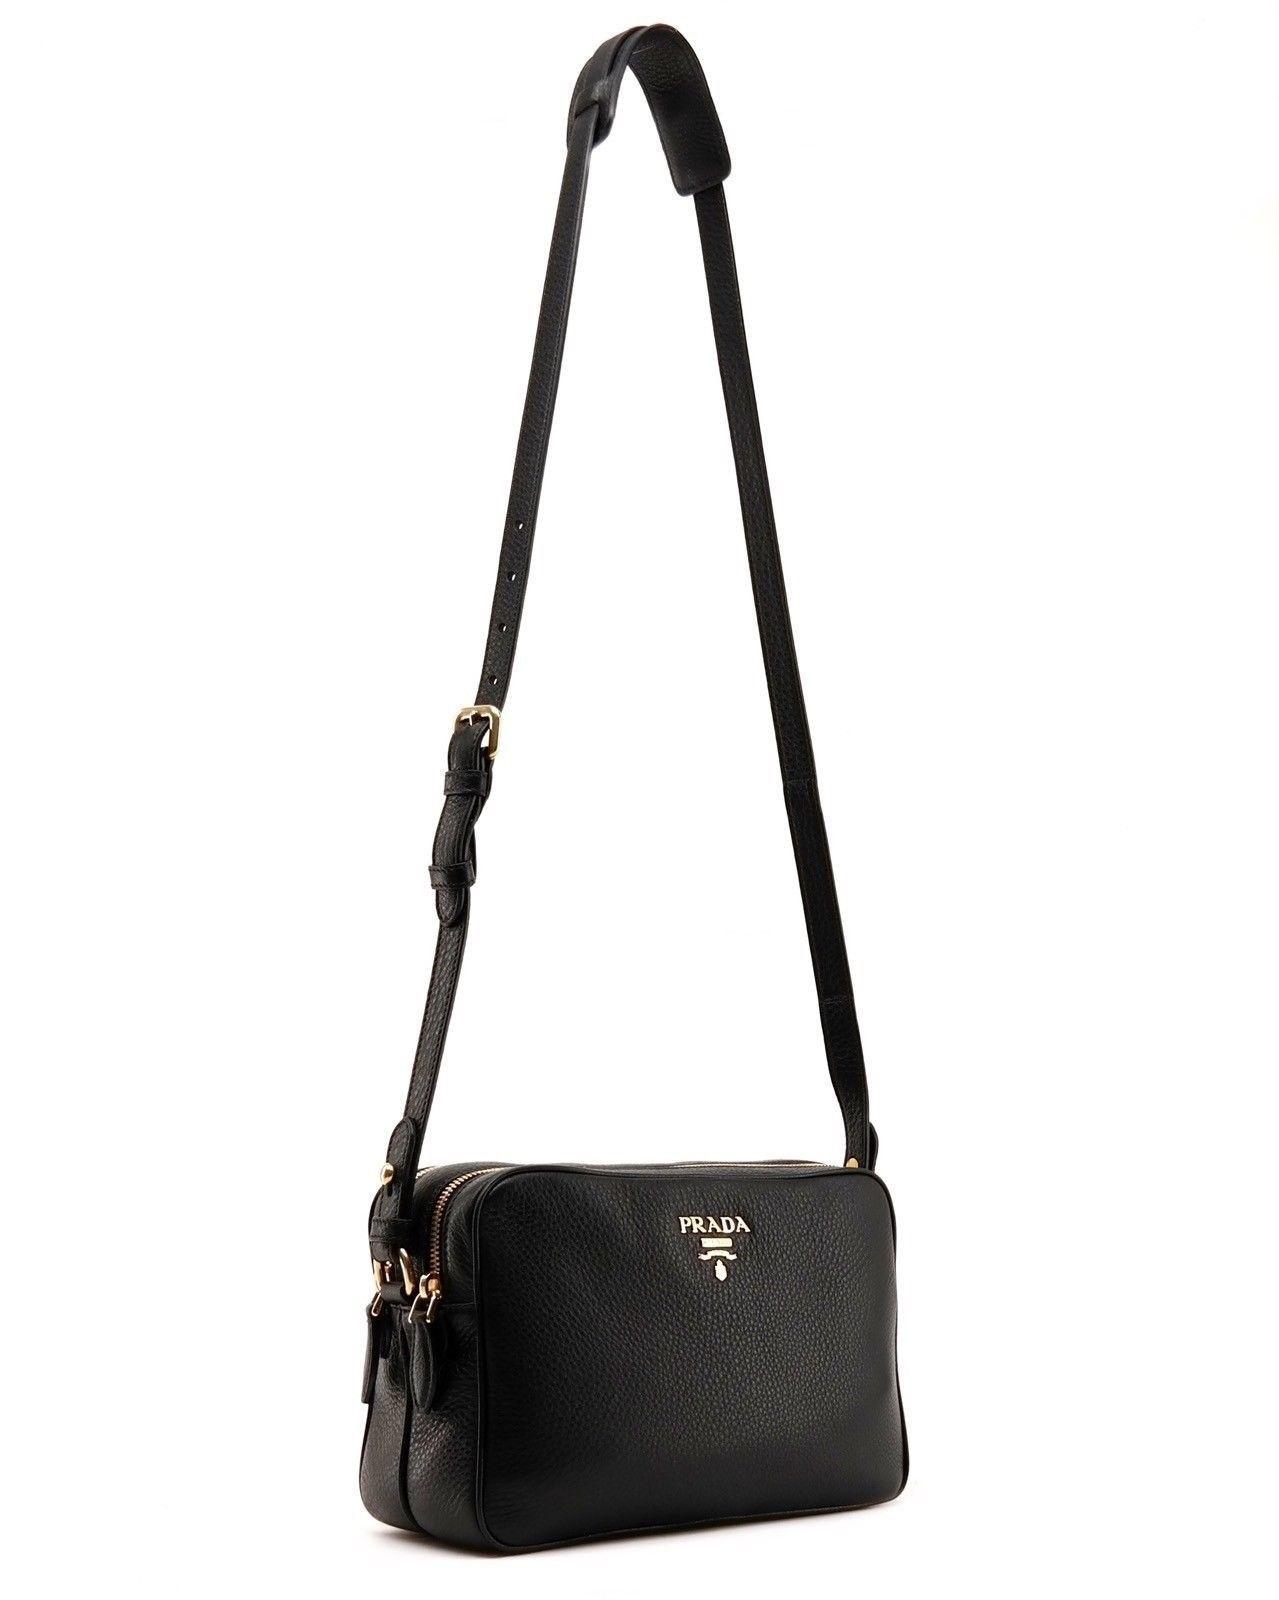 9bff47eb9836e5 Prada Croossbody Camera Bag Large Double Zip Black Leather New